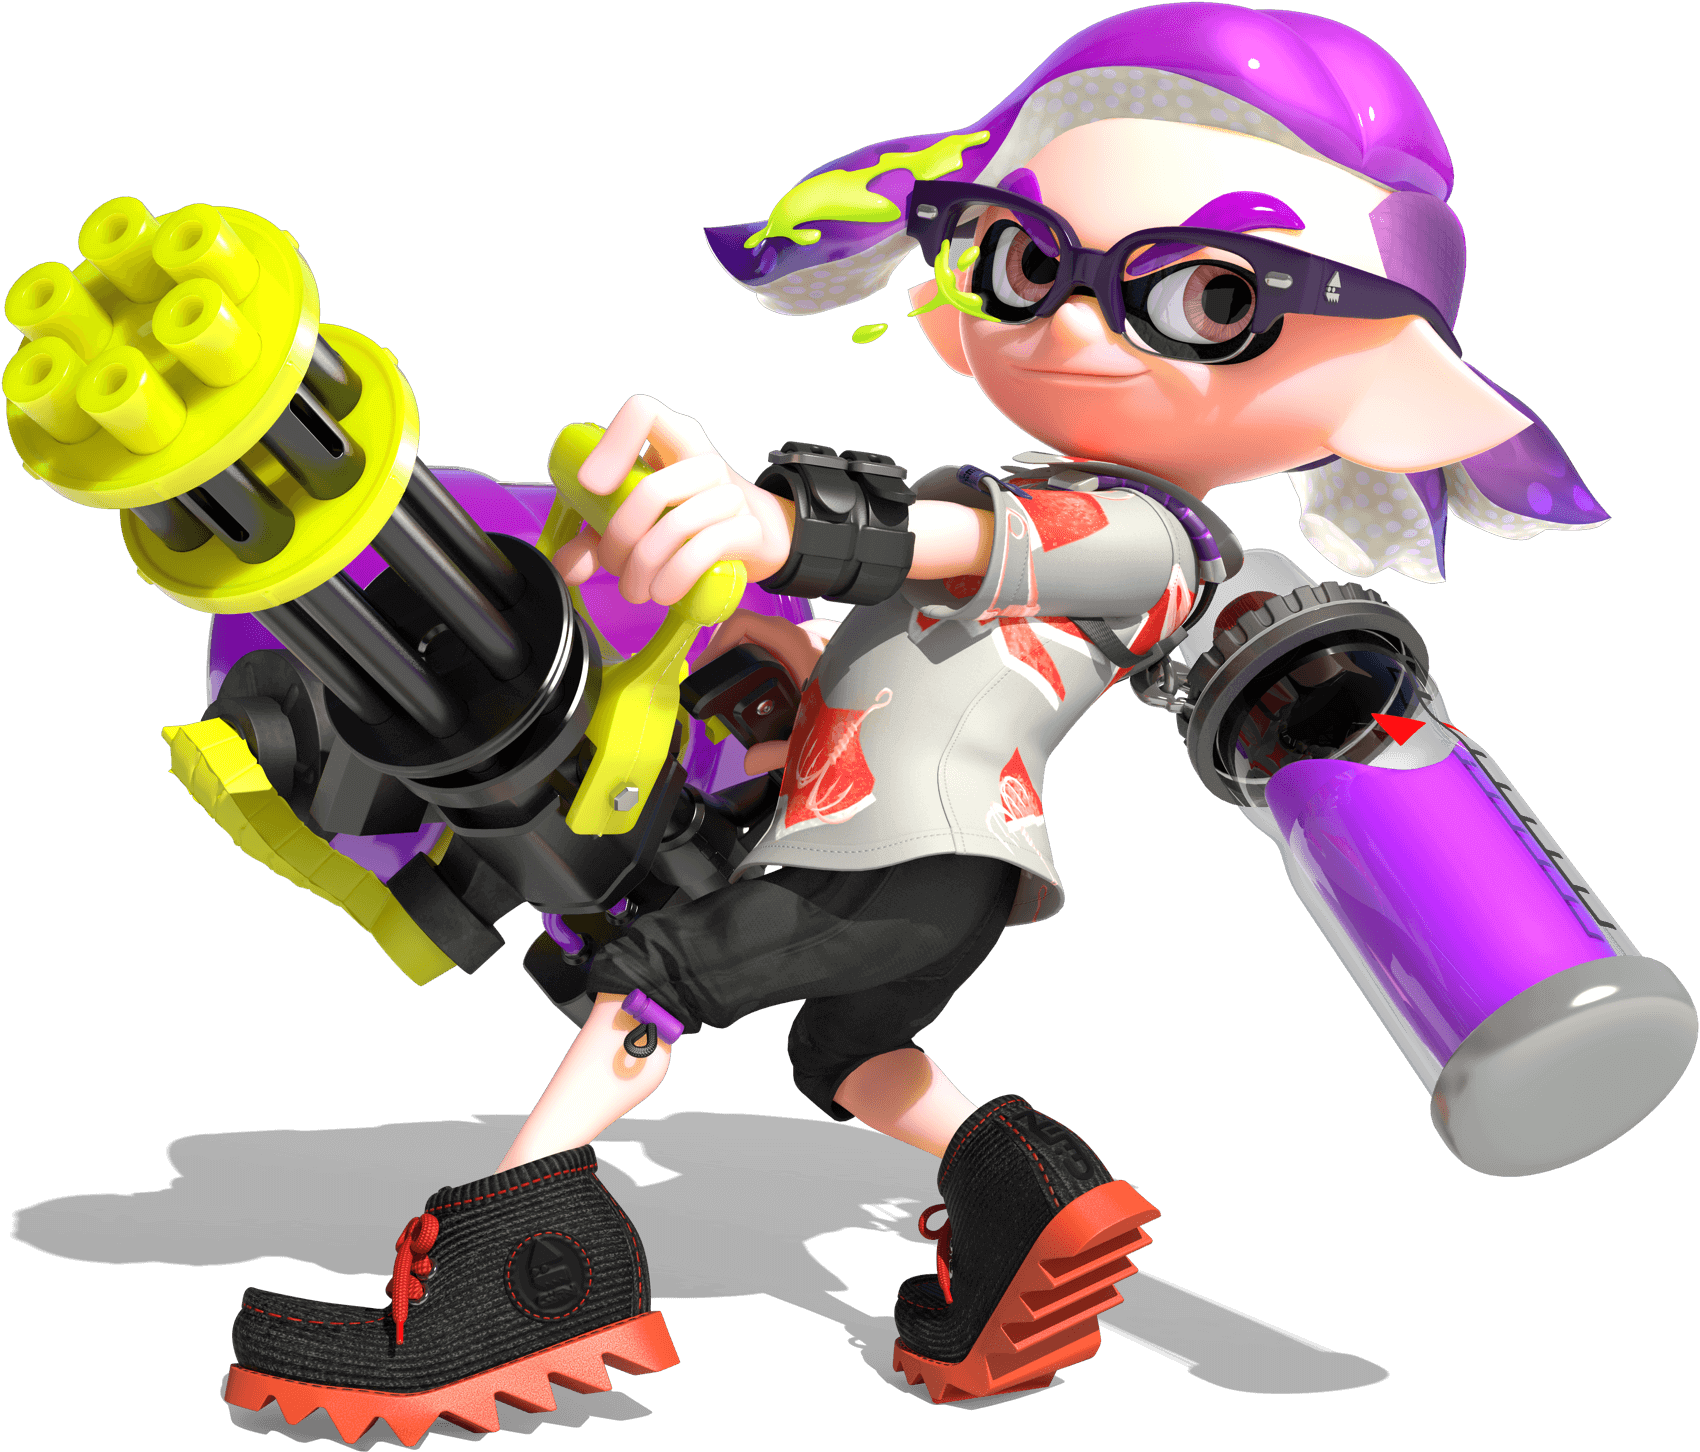 Gear Splatoon 2 for Nintendo Switch Multiplayer